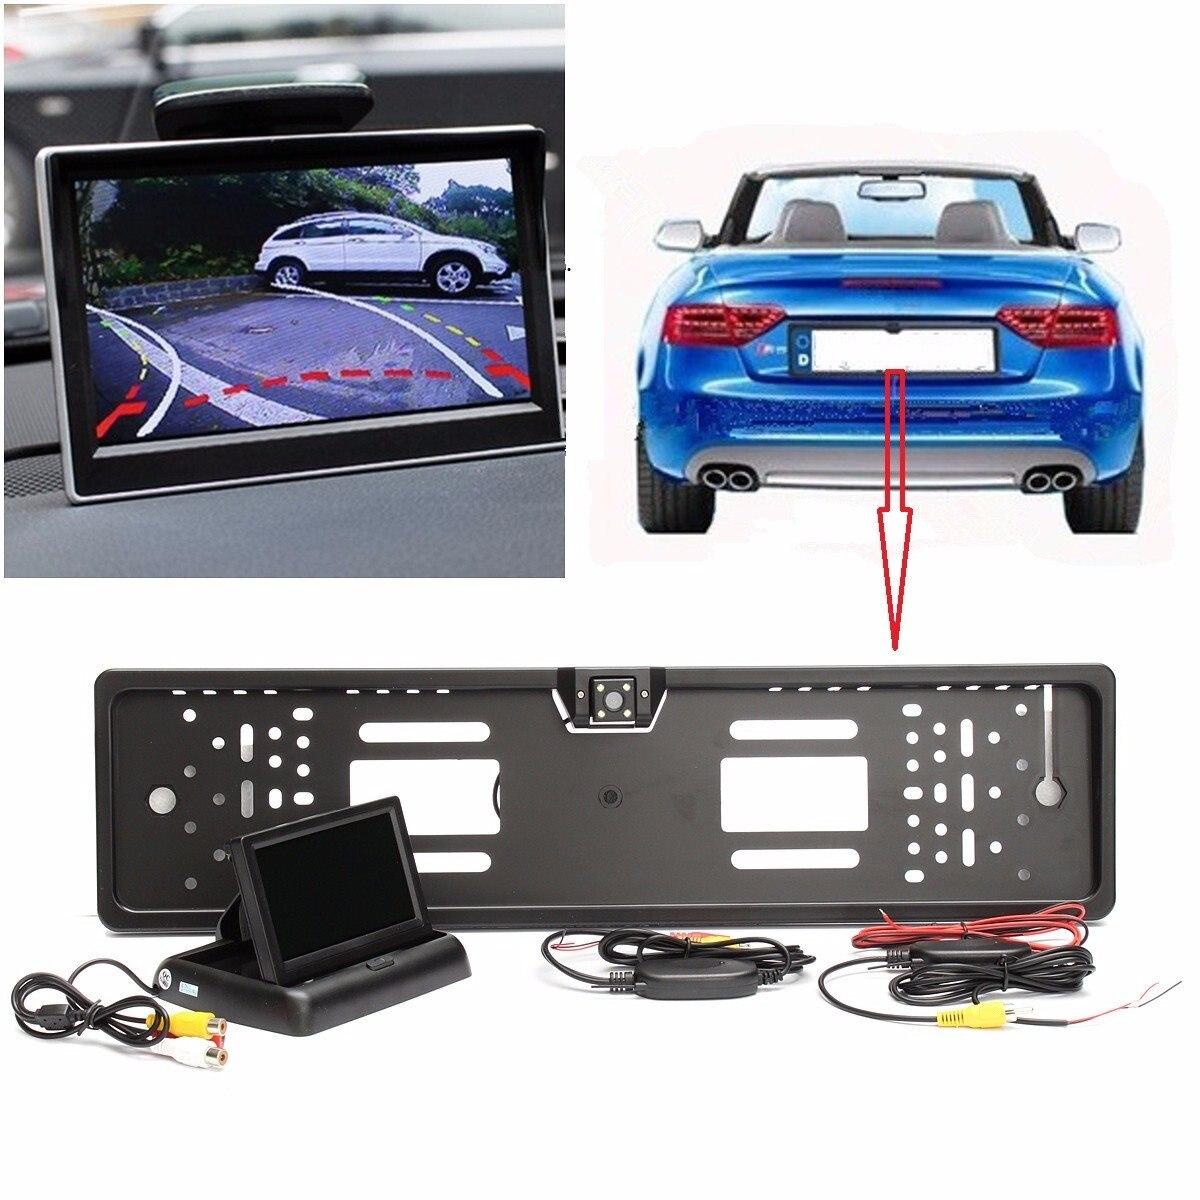 120 Degree Wireless License Plate Rear View Kit Reversing Night Vision Car Camera 4 3 Inch